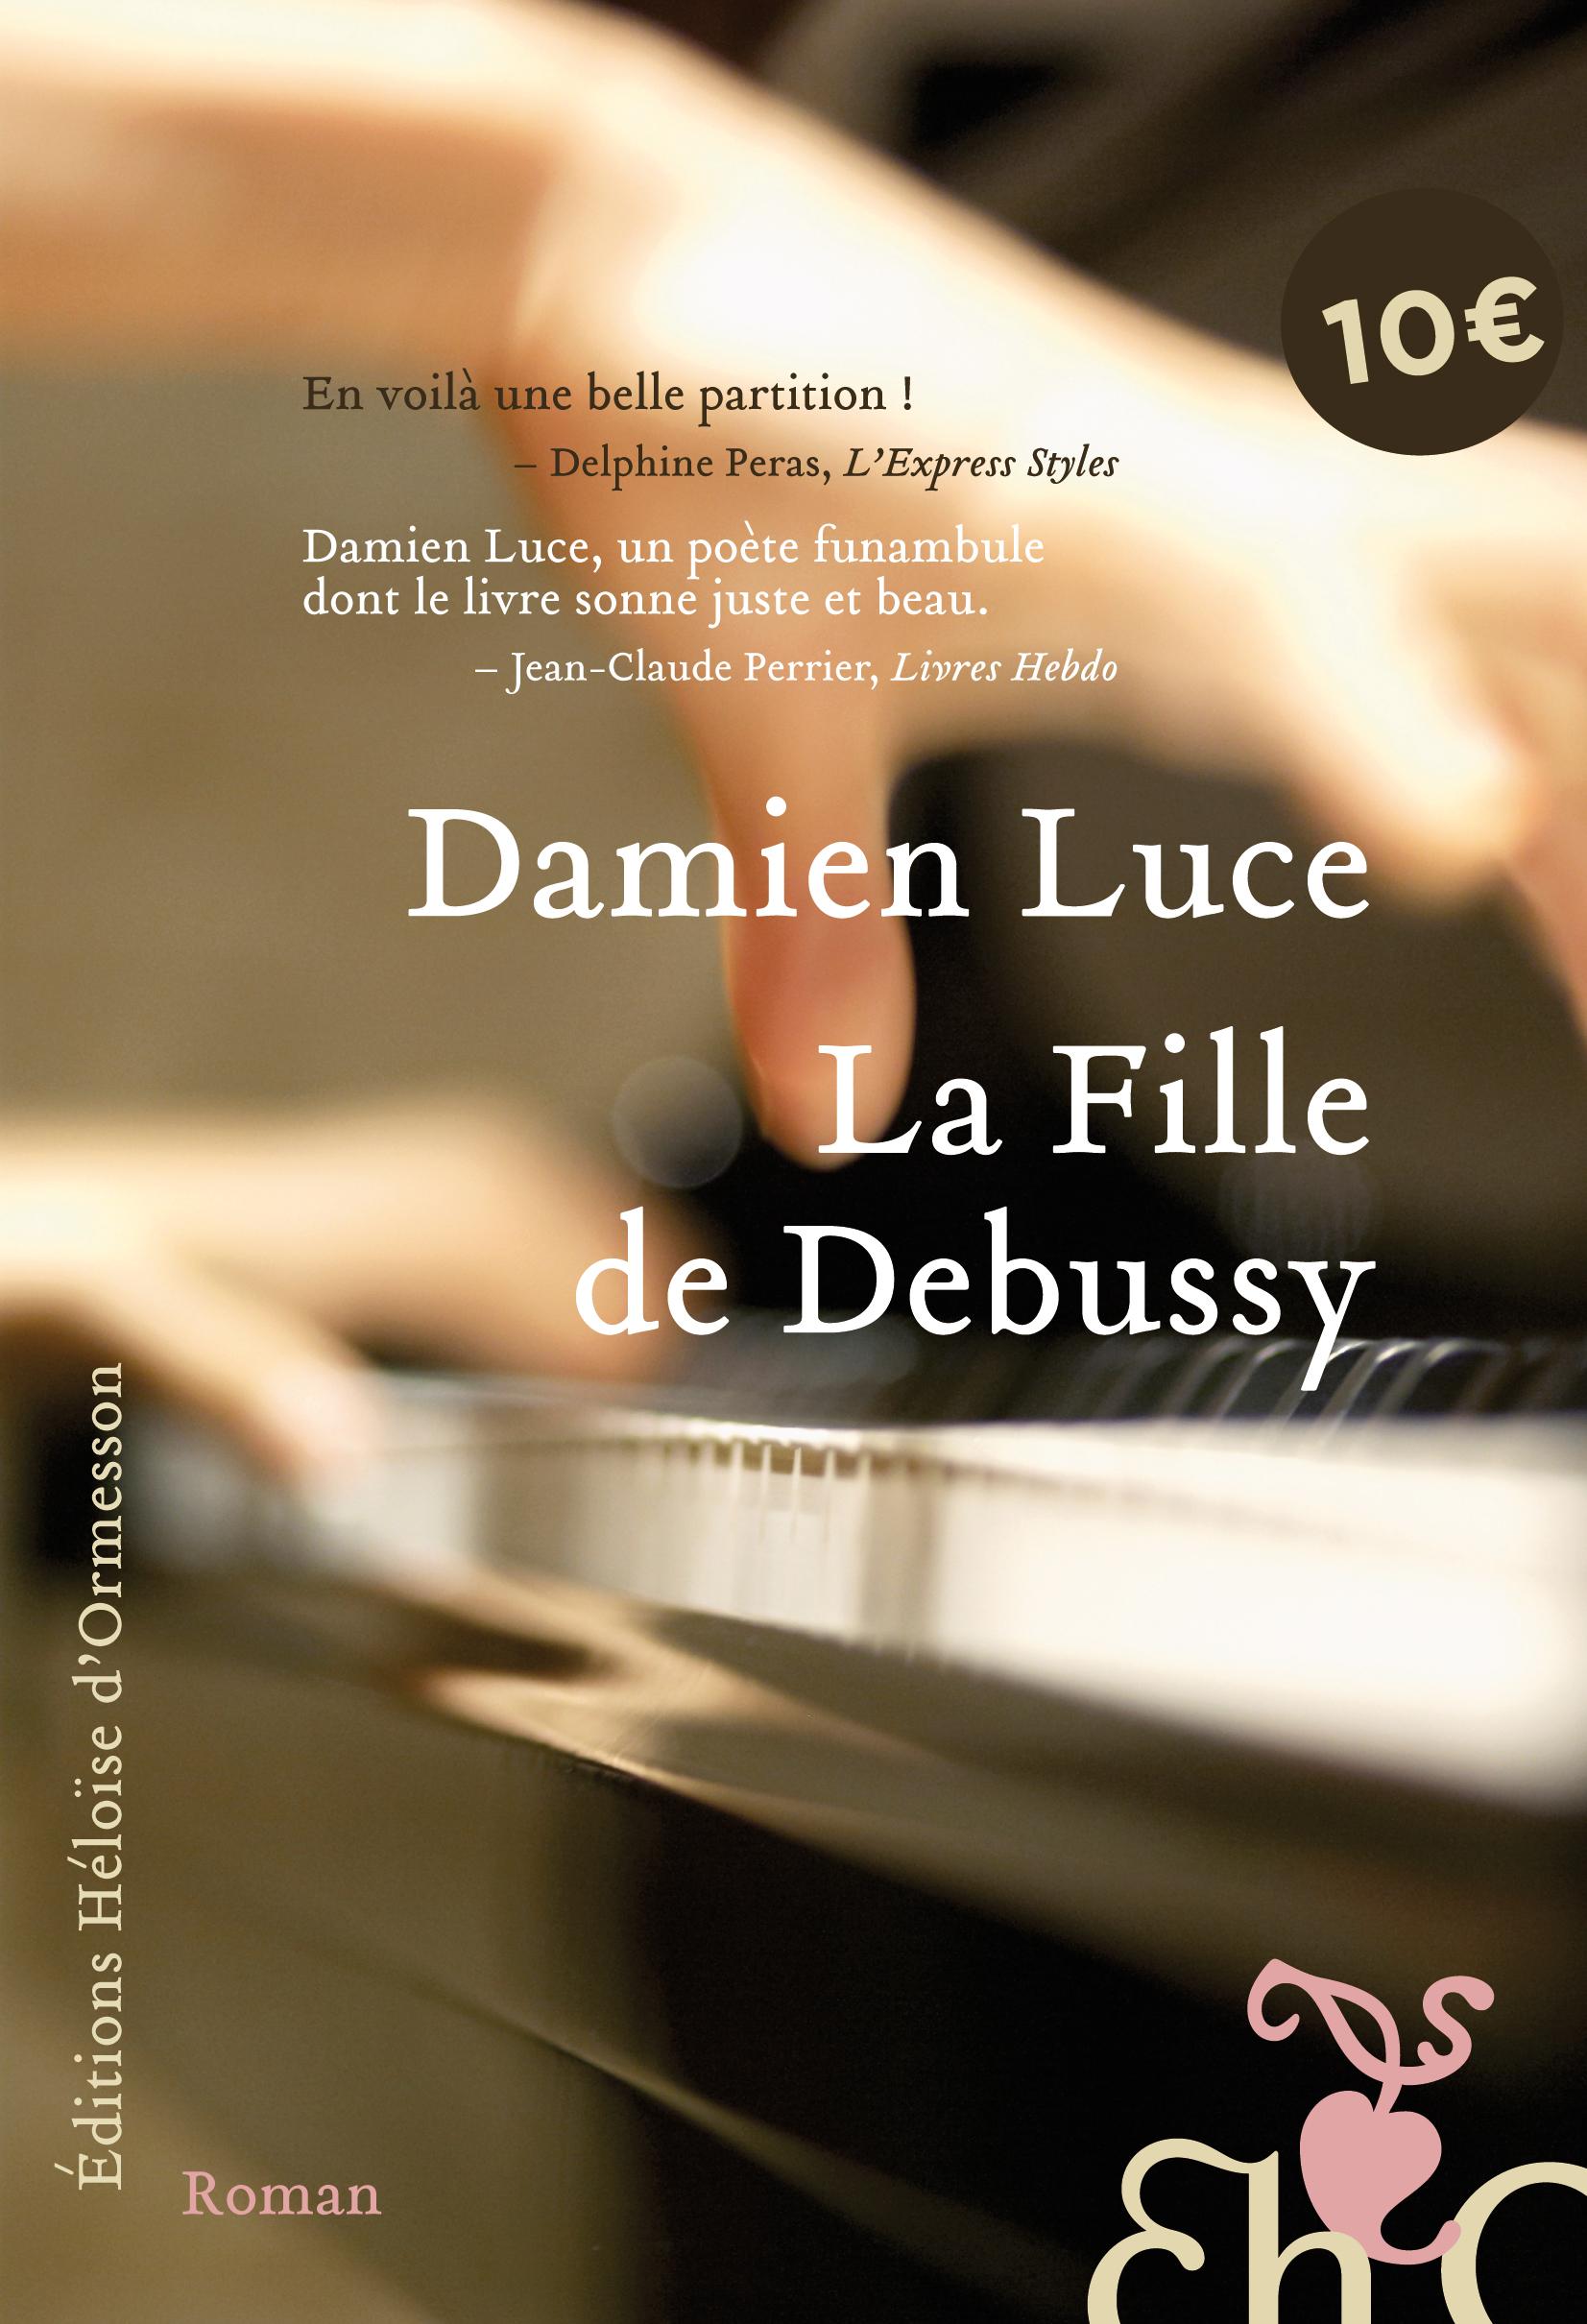 visuel_la_fille_de_debussy_damien_luce_eho_2eme_sortie